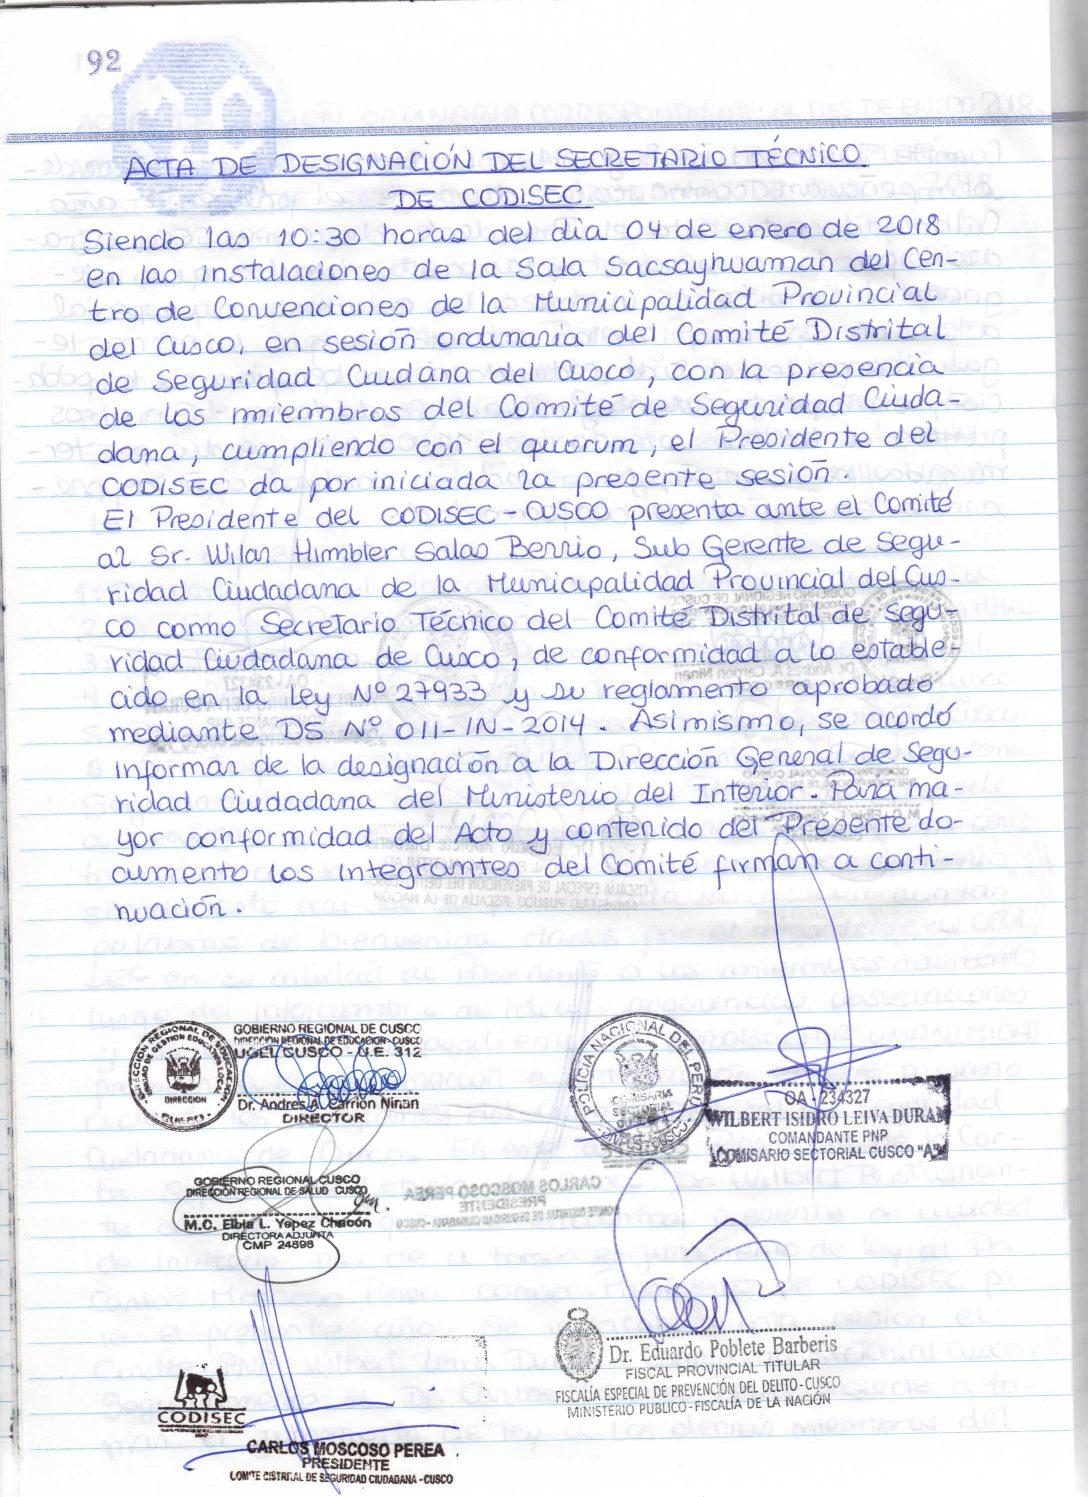 DESIGNACION SECRETARIO TECNICO CODISEC CUSCO 2018